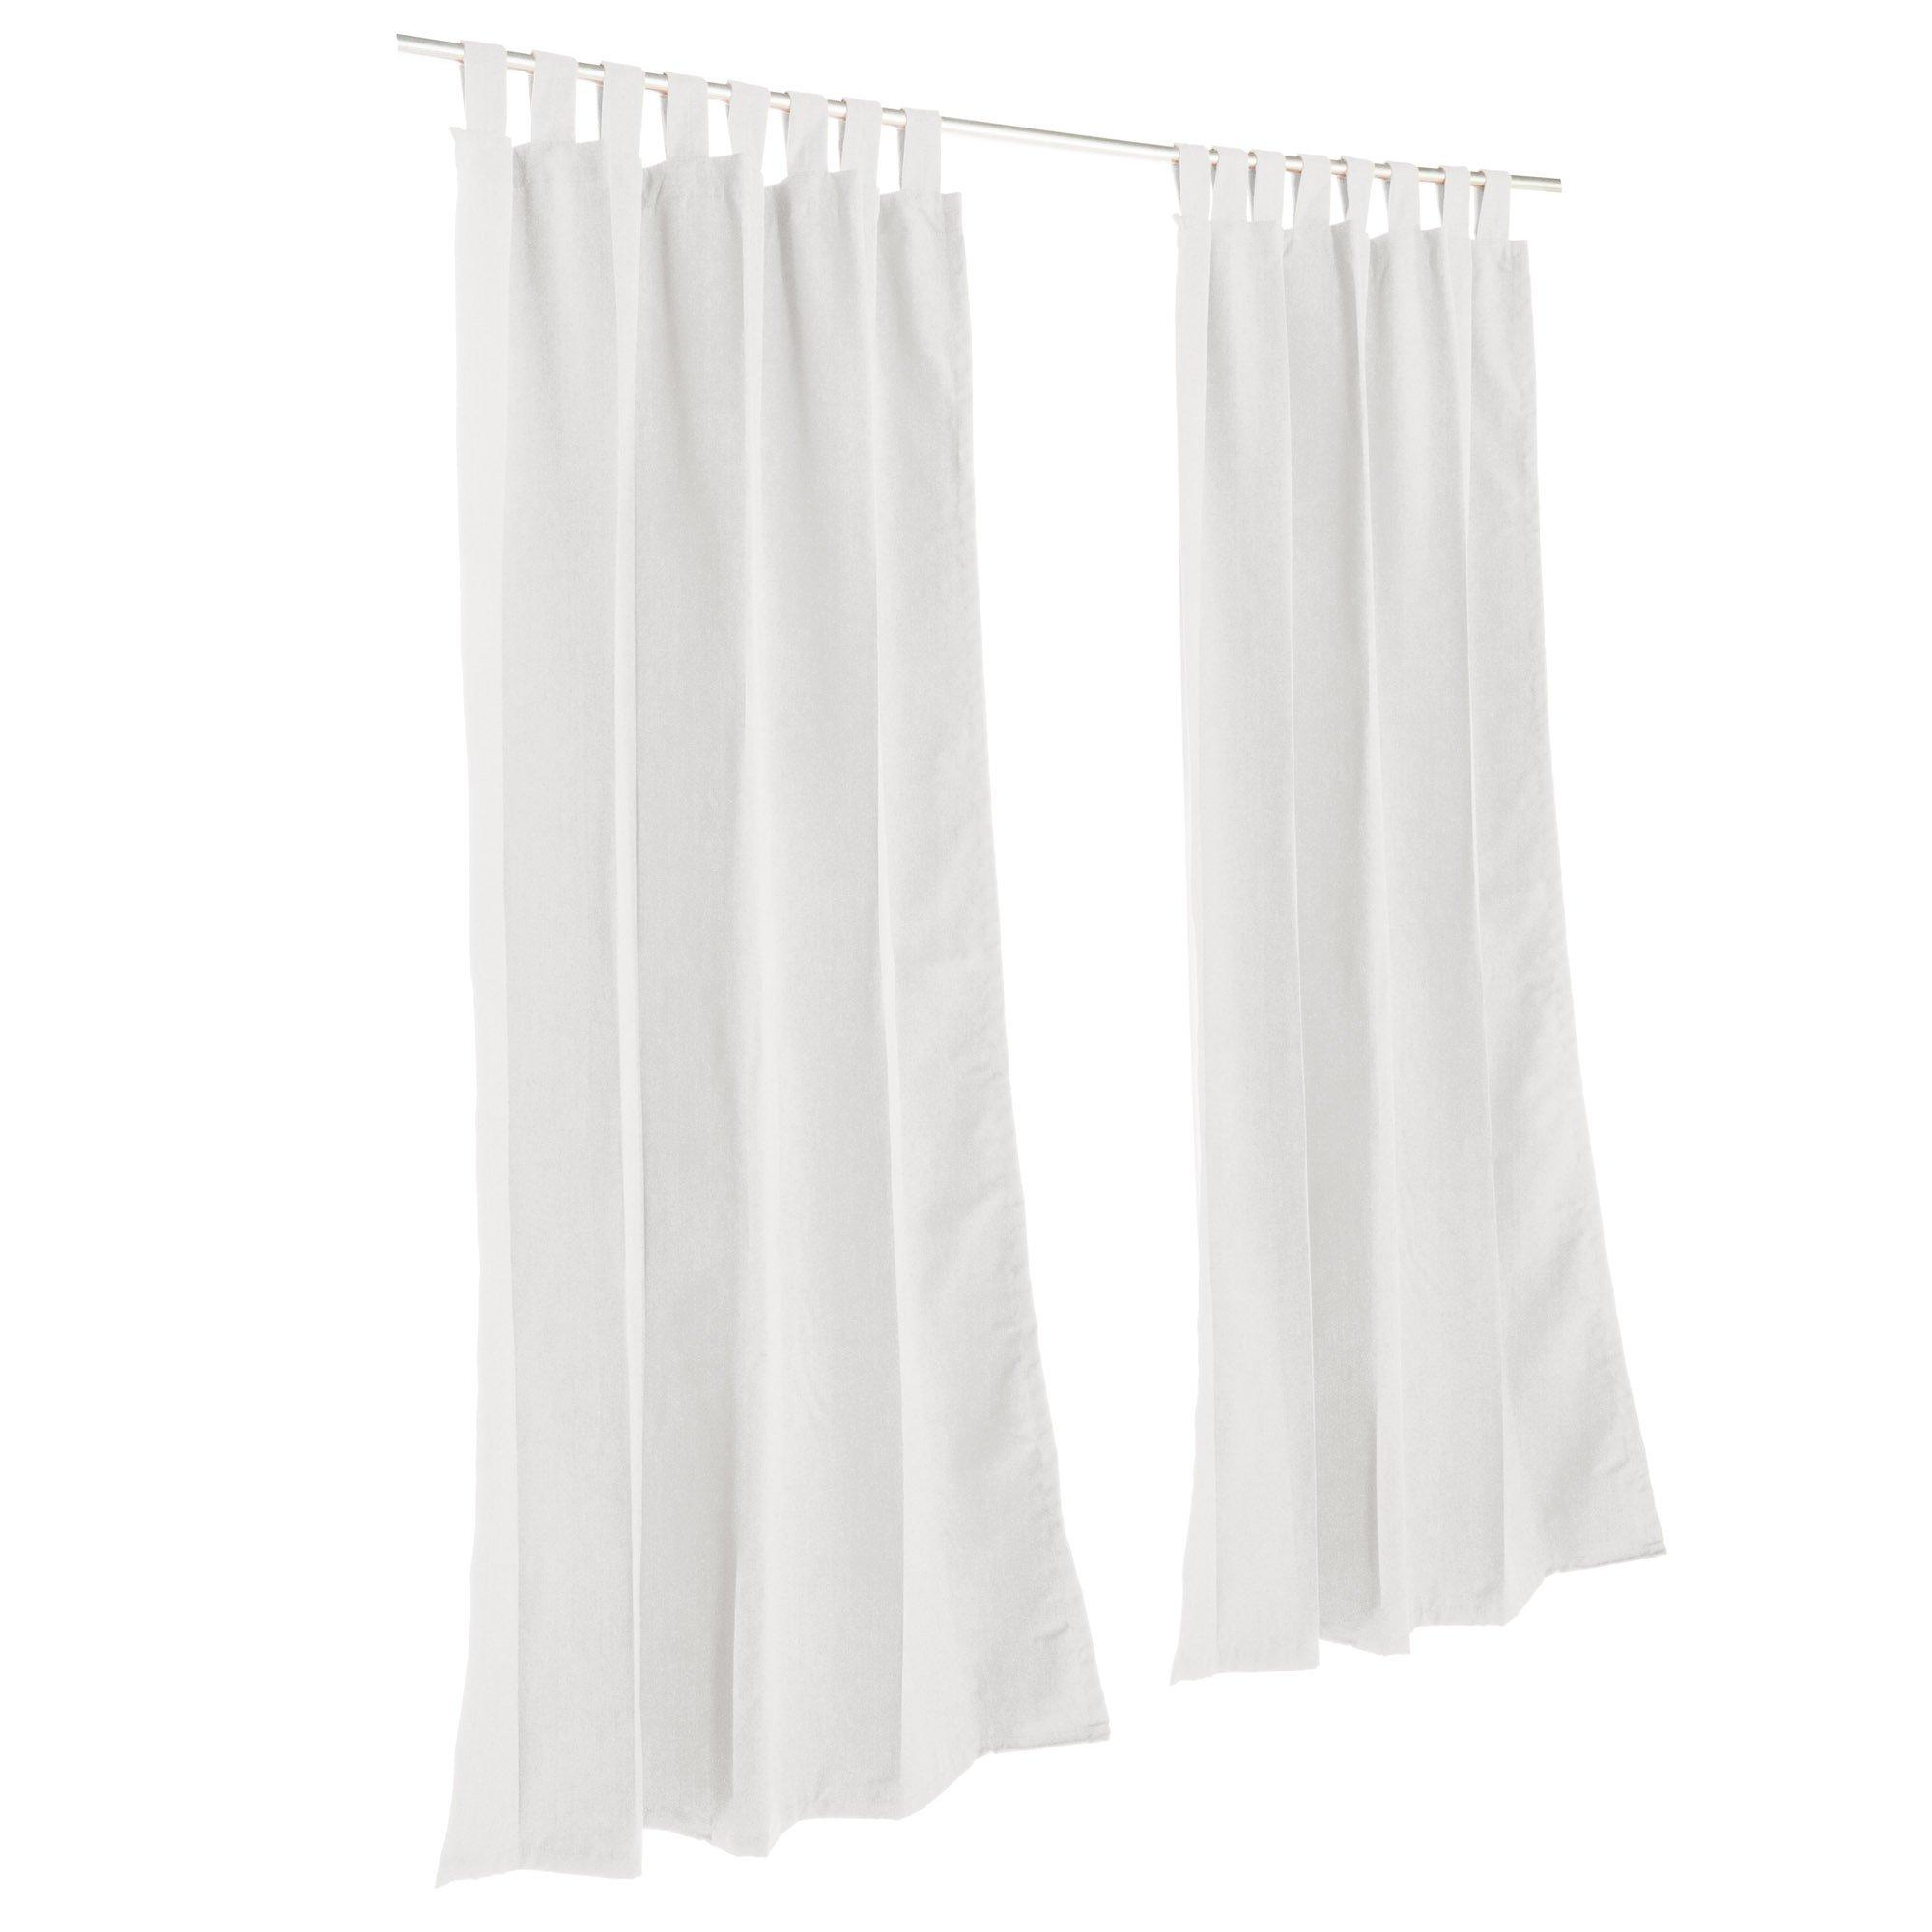 Hatteras Hammocks Pawleys Island Sunbrella Outdoor Gazebo Tabbed Solid Curtain Panel Canvas White 50'' x 84''